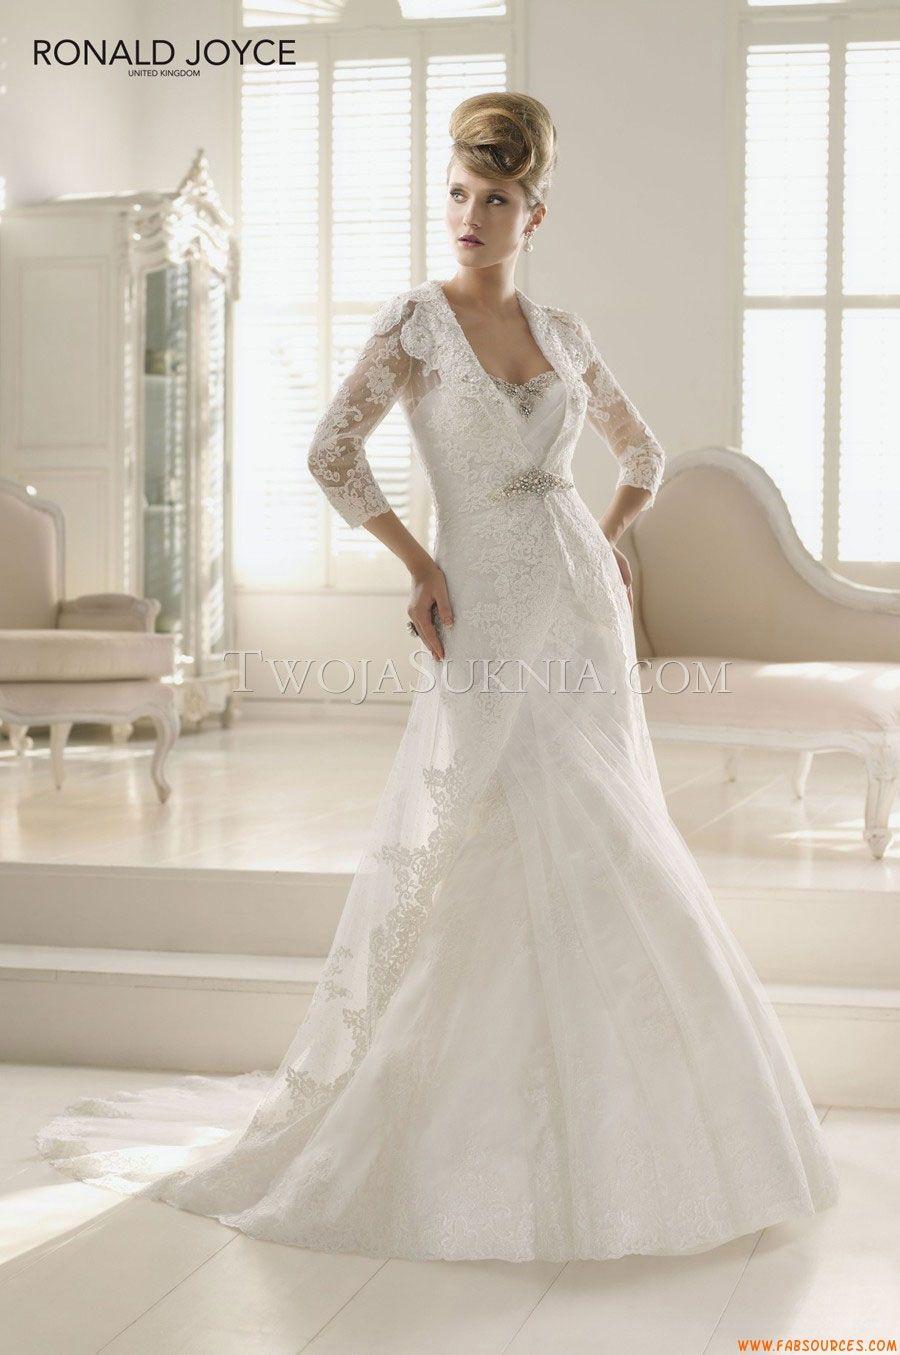 Robes de mariée ronald joyce poppy mariage de rêve